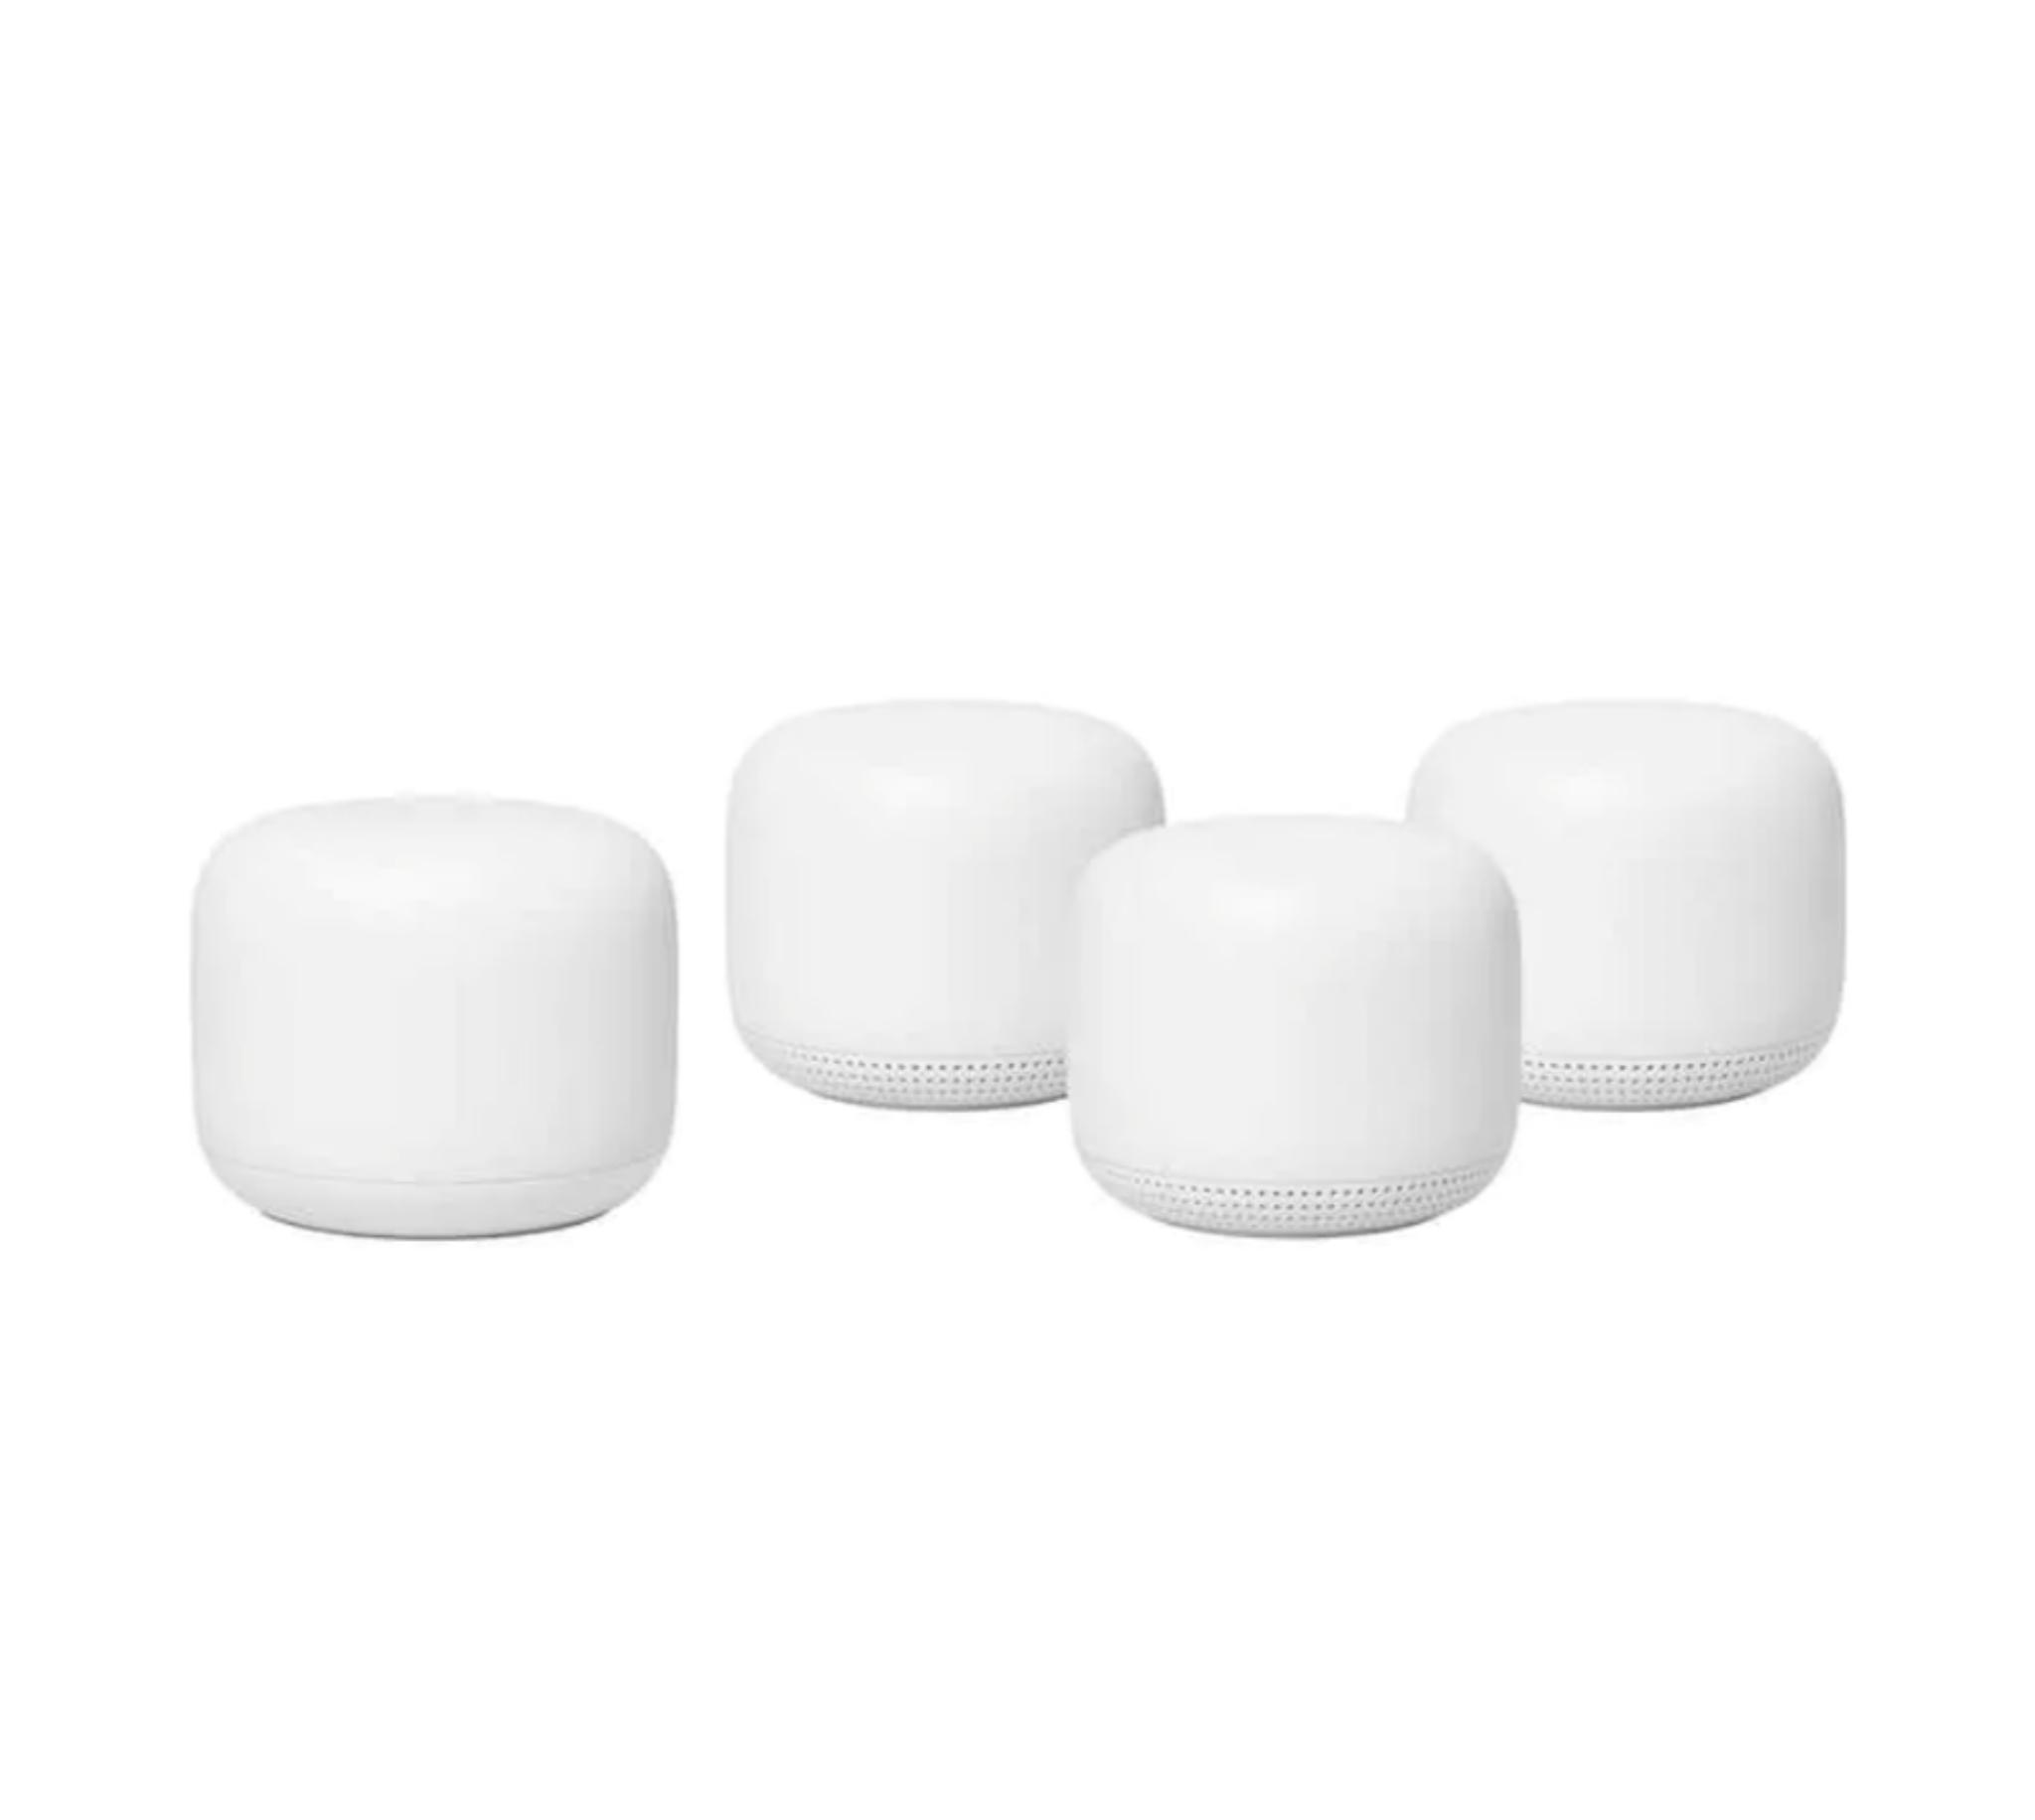 Costco Members: Google Nest Wifi Router - AC2200 Smart Mesh Wi-Fi Router 4 pack $399.99|Google Wifi - AC1200 Smart Mesh Wi-Fi 4 Pack $229.99